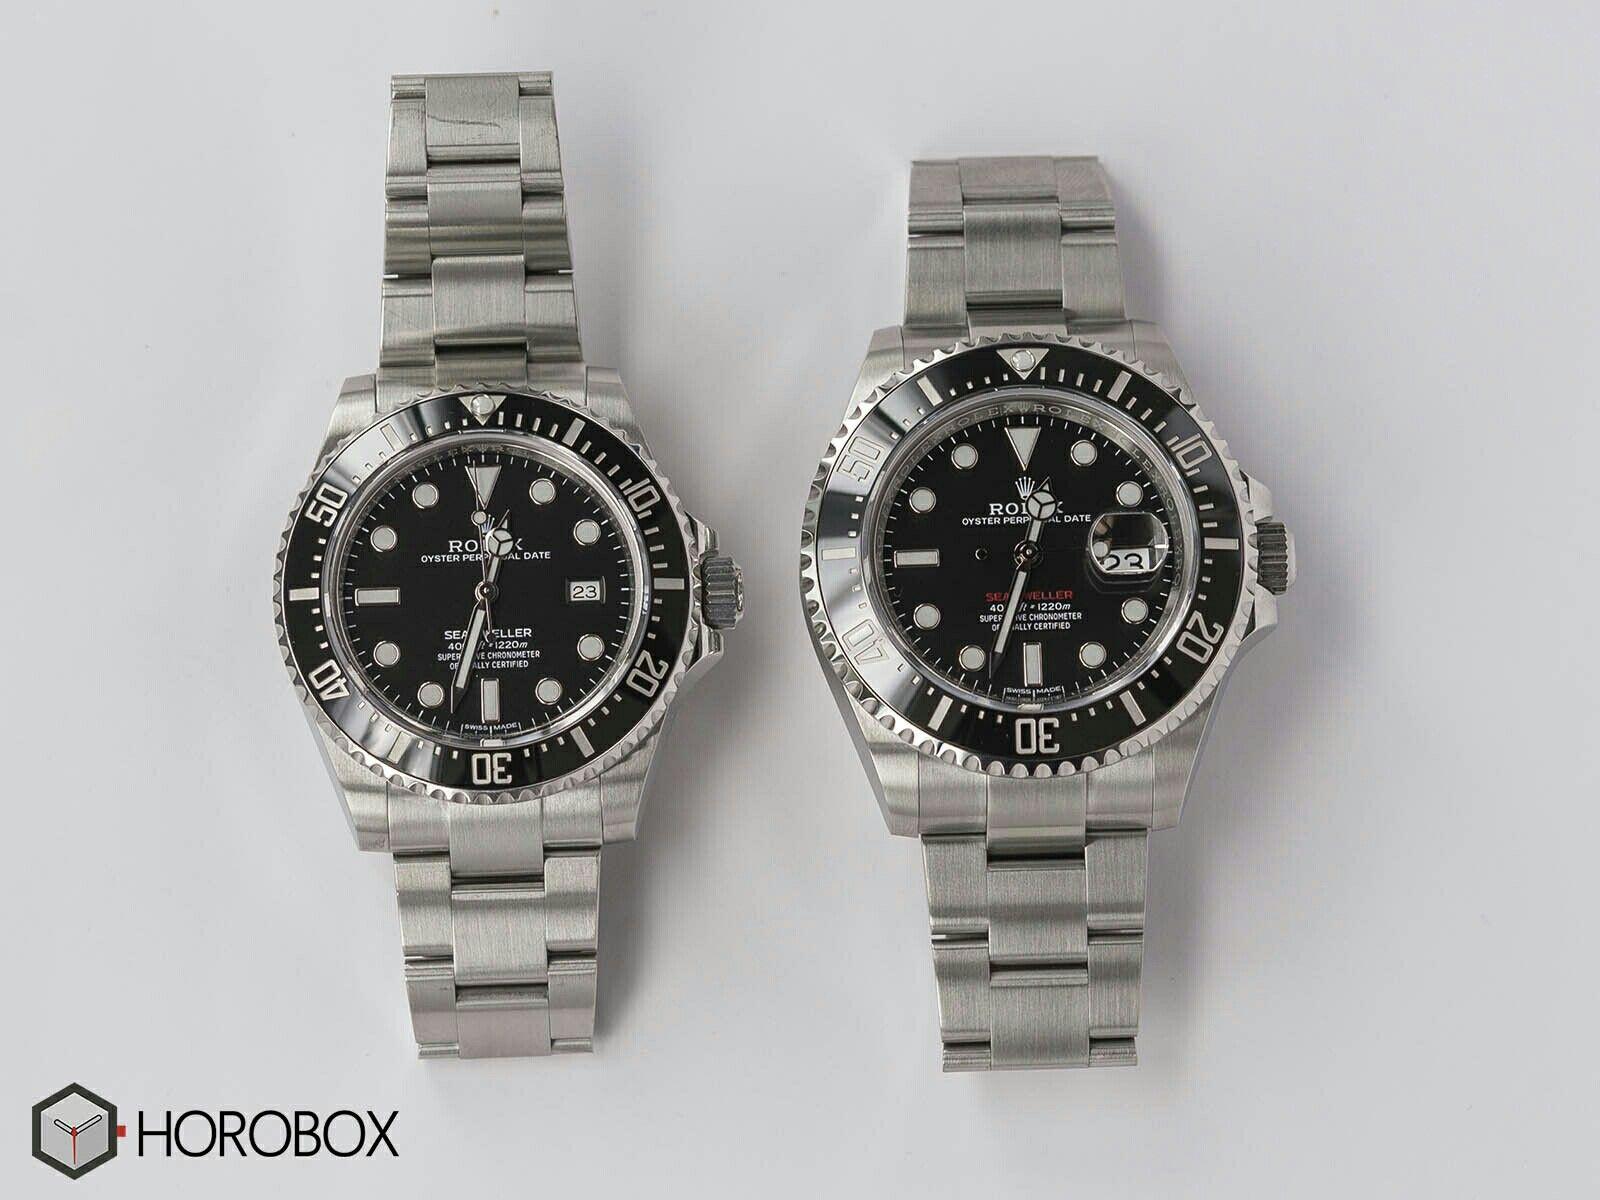 64c8cfa0537 ROLEX SEA DWELLER REF. 126600 VS SEA DWELLER REF. 116600 | Watches ...